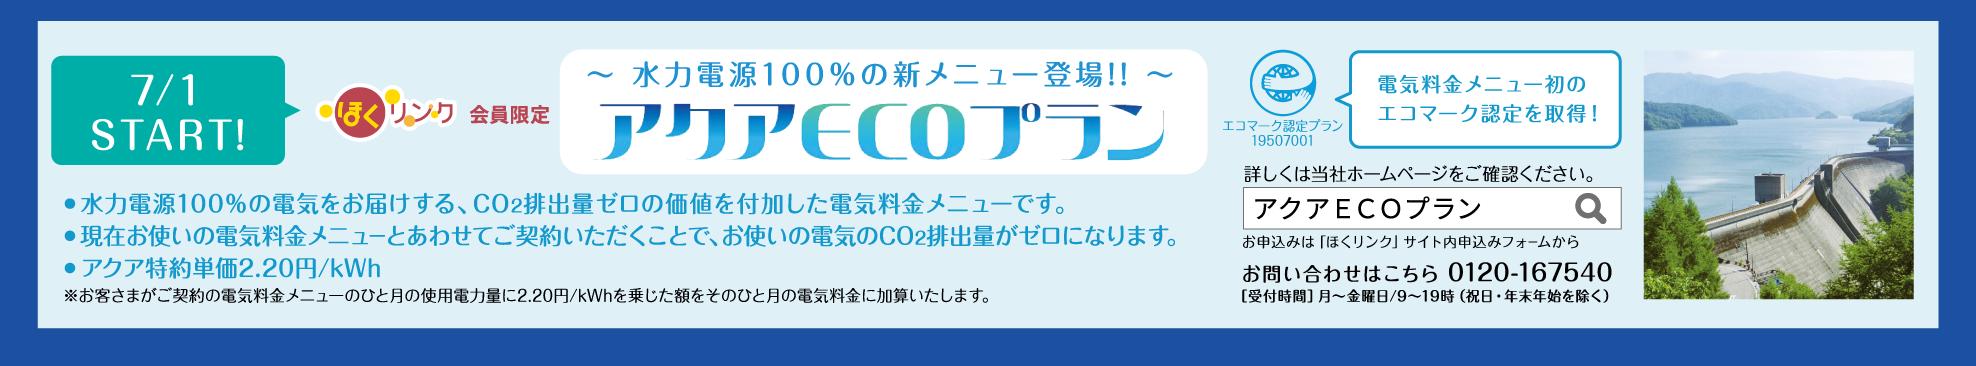 7/1  START! ほくリンク会員限定 ~ 水力電源100%の新メニュー登場!! ~ アクアECOプラン ● 水力電源100%の電気をお届けする、CO2排出量ゼロの価値を付加した電気料金メニューです。● 現在お使いの電気料金メニューとあわせてご契約いただくことで、お使いの電気のCO2排出量がゼロになります。● アクア特約単価2.20円/kWh ※お客さまがご契約の電気料金メニューのひと月の使用電力量に2.20円/kWhを乗じた額をそのひと月の電気料金に加算いたします。電気料金メニュー初のエコマーク認定を取得!詳しくは当社ホームページをご確認ください。お問い合わせはこちら 0120-167540 [受付時間]月~金曜日/9~19時(祝日・年末年始を除く)